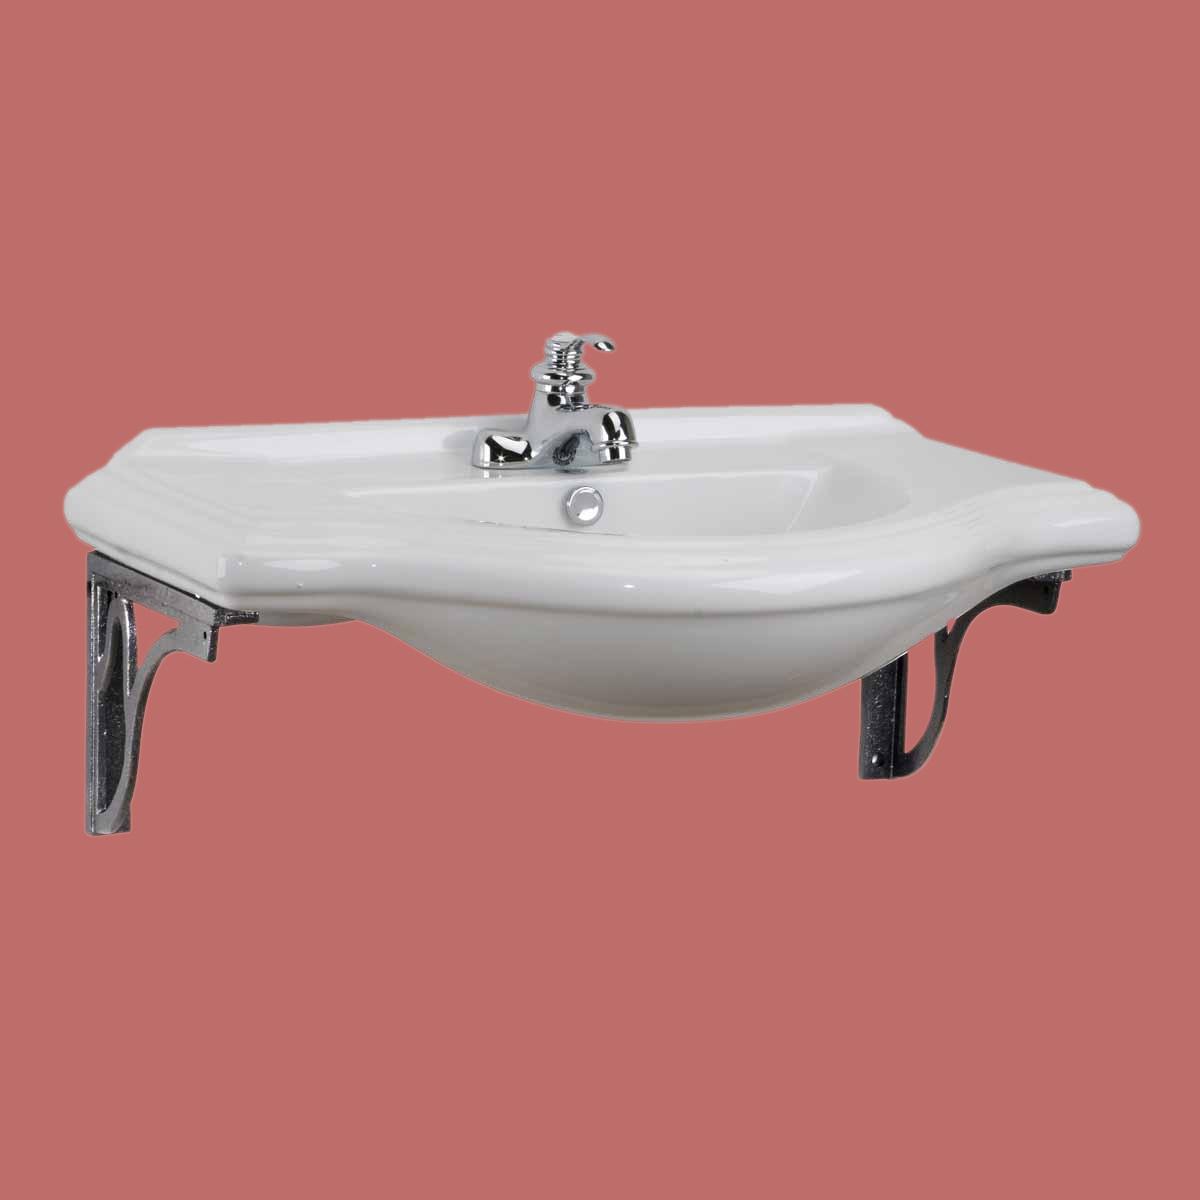 Kohler Sink Protectors : Better Houseware Large Sink Protector Stainless Steel Kitchen Bar Chef ...